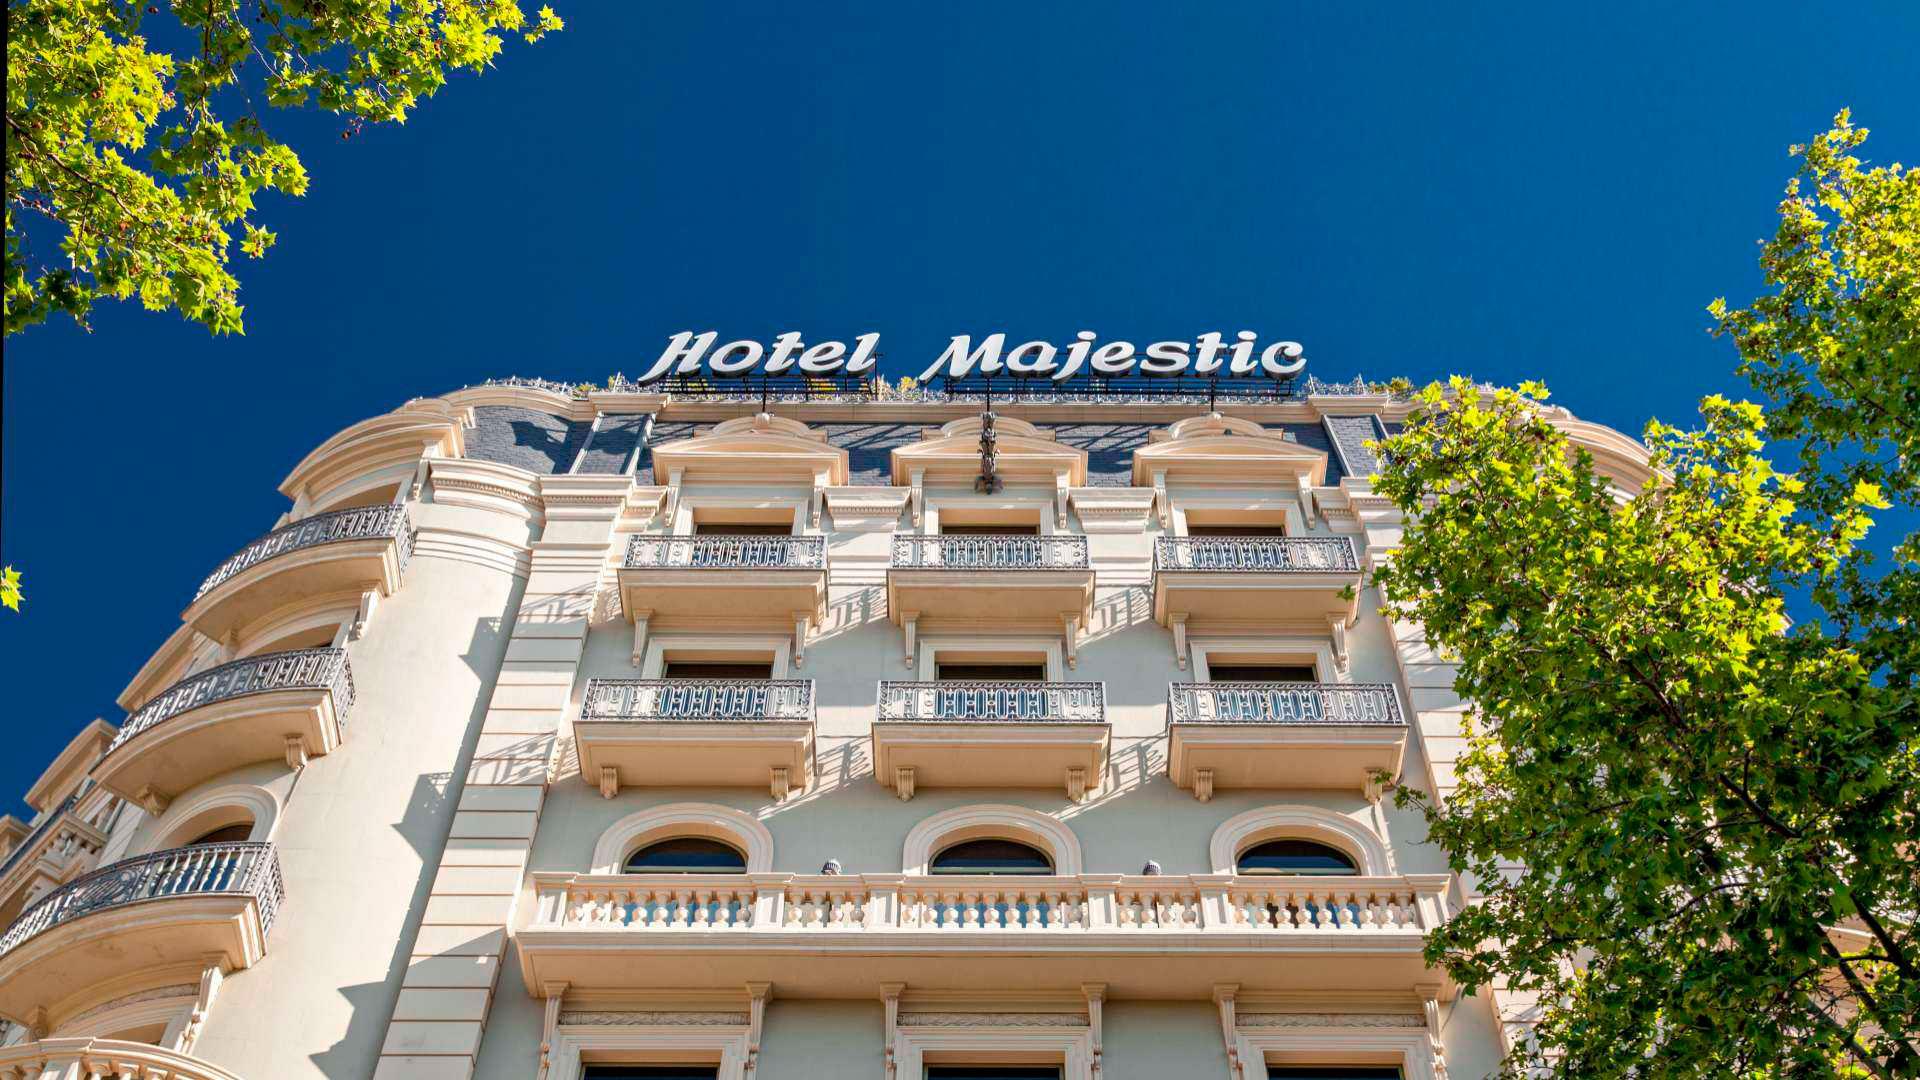 Imagen del hotel Majestic en Barcelona